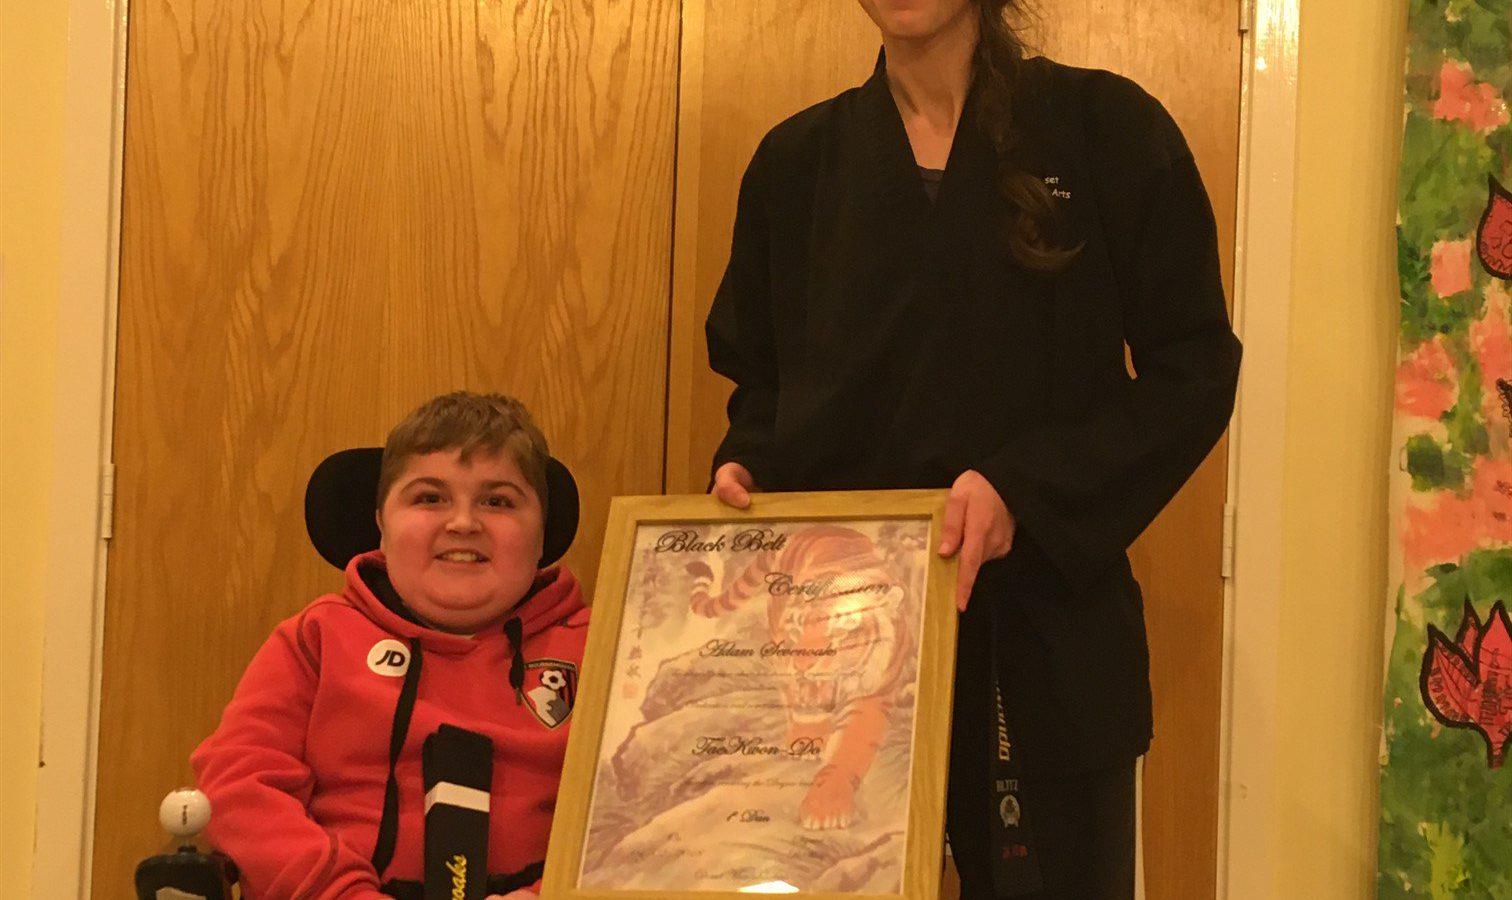 Adam Champ adam - taekwondo champ! - action duchenne